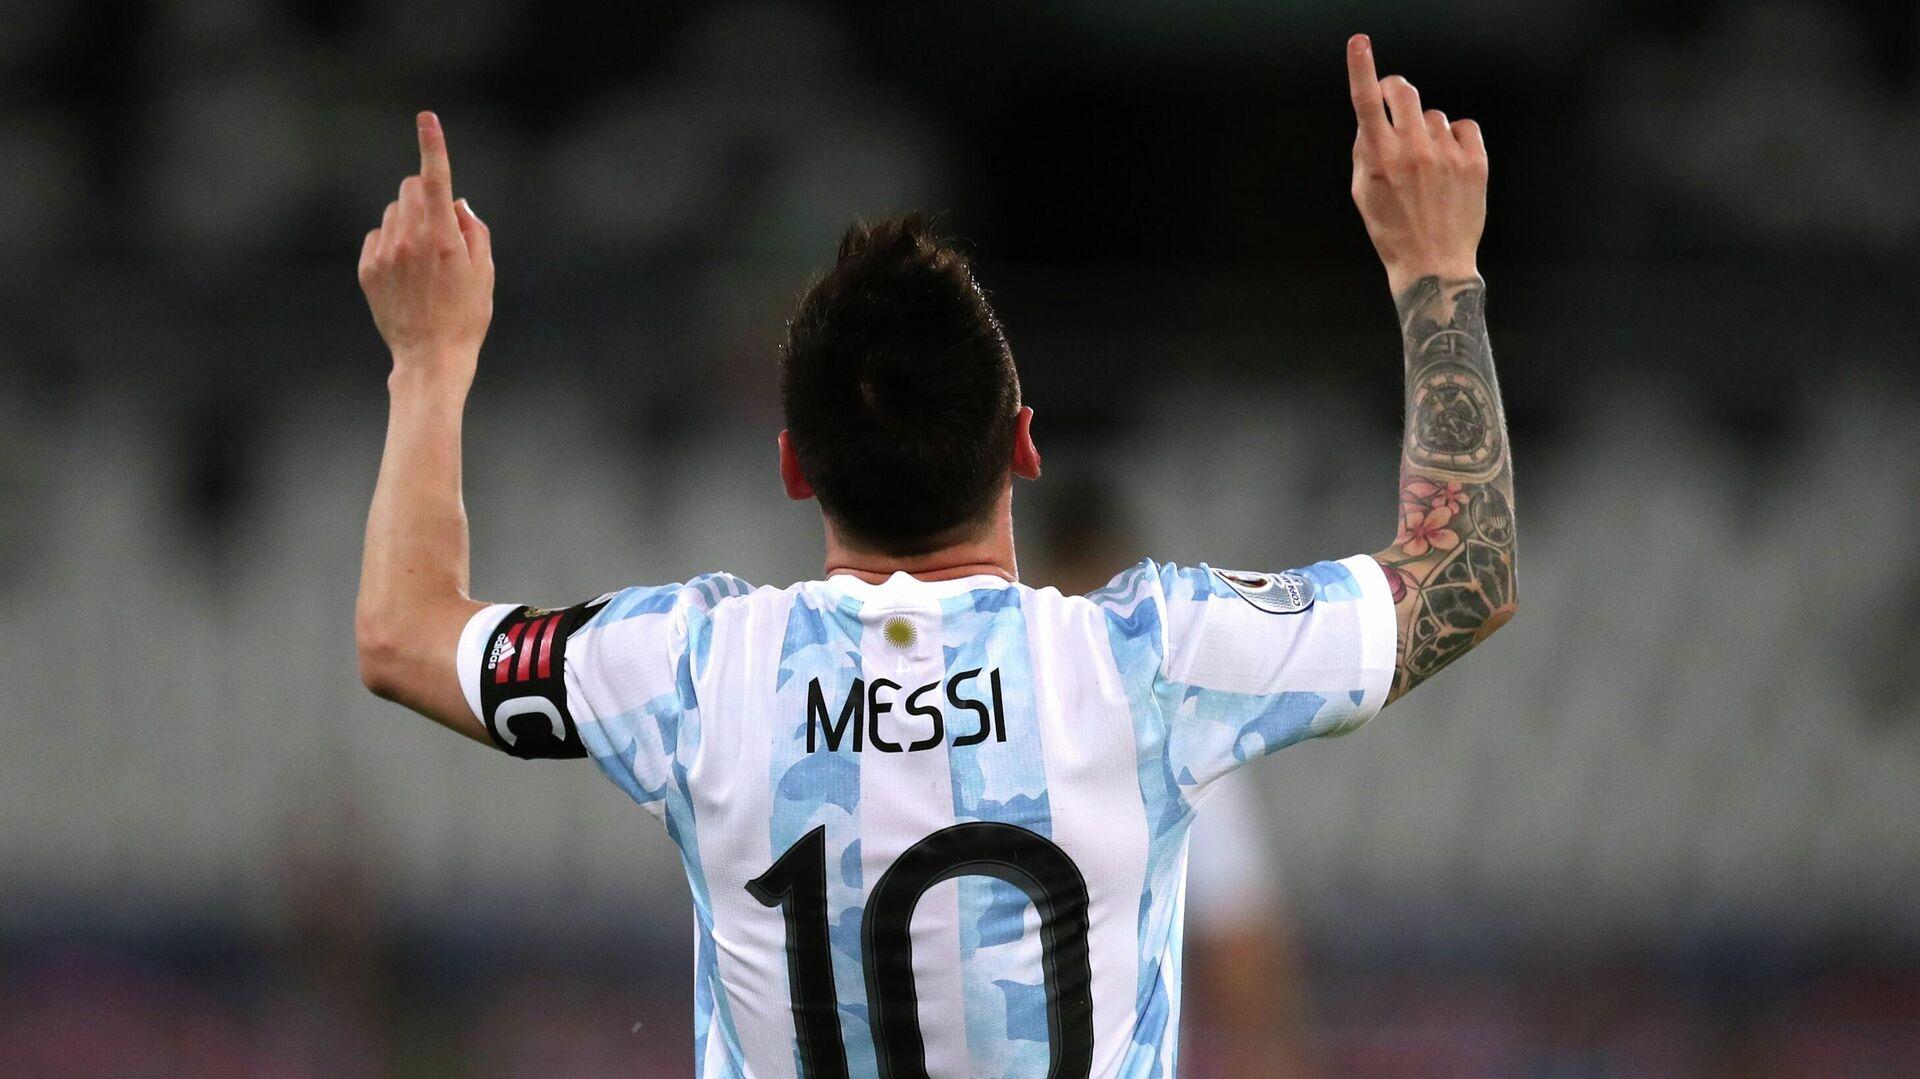 Lionel Messi en la Copa América 2021 - Sputnik Mundo, 1920, 21.06.2021